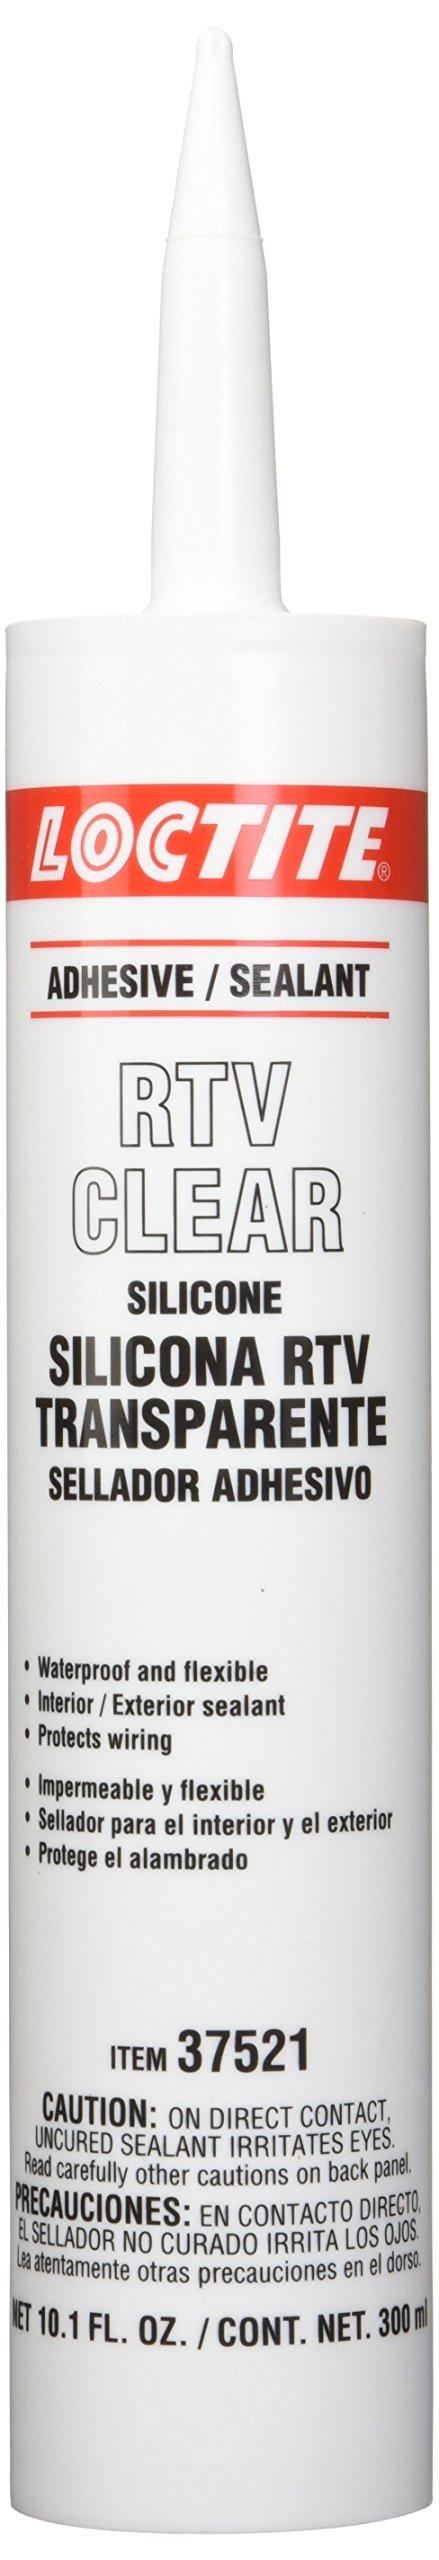 Loctite 37521 Silicone Adhesive/Sealant, 300 ml